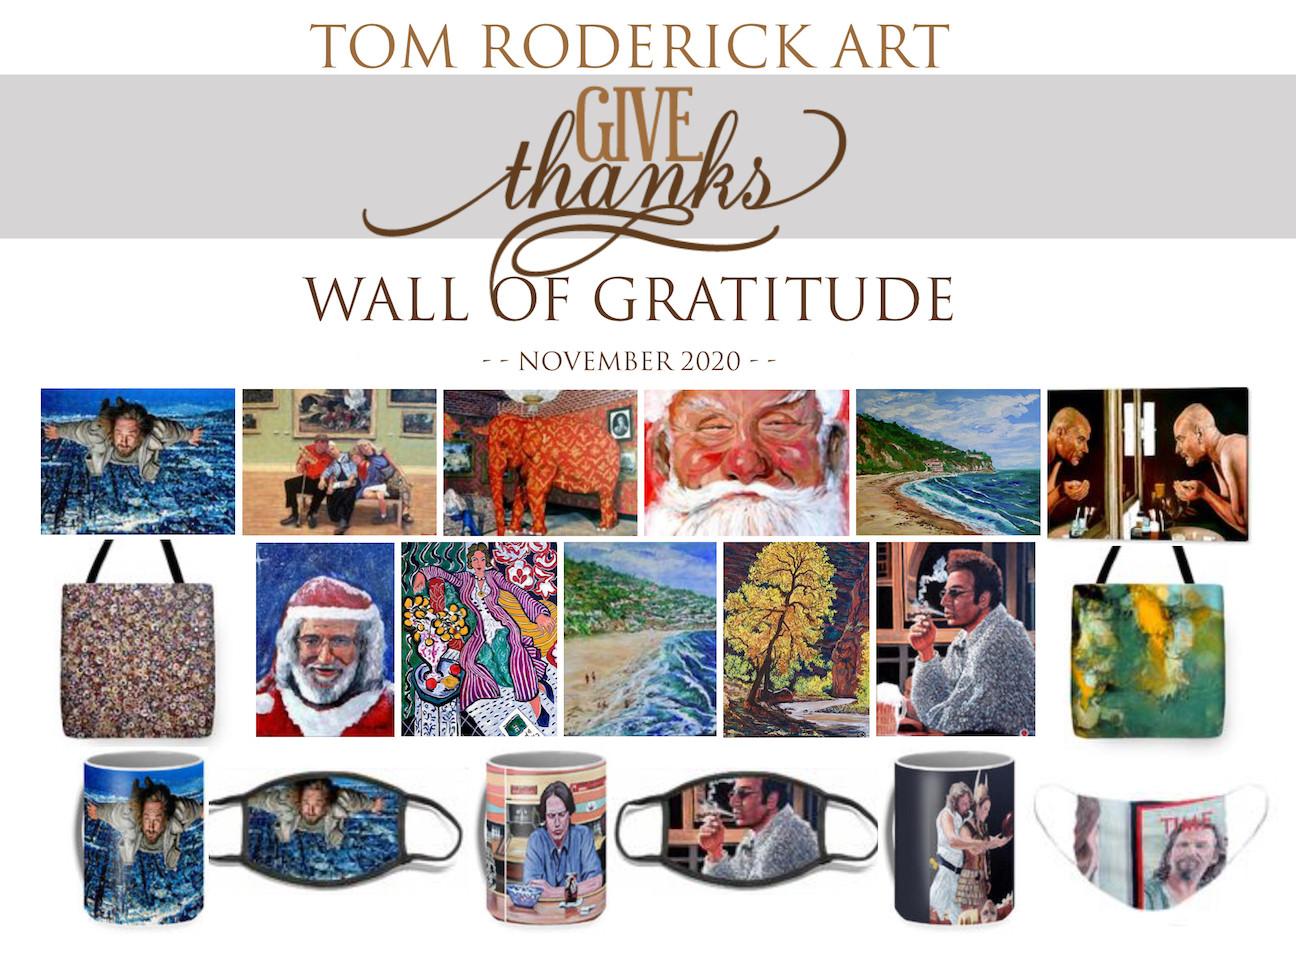 November 2020 Wall of Gratitude Tom Roderick Art